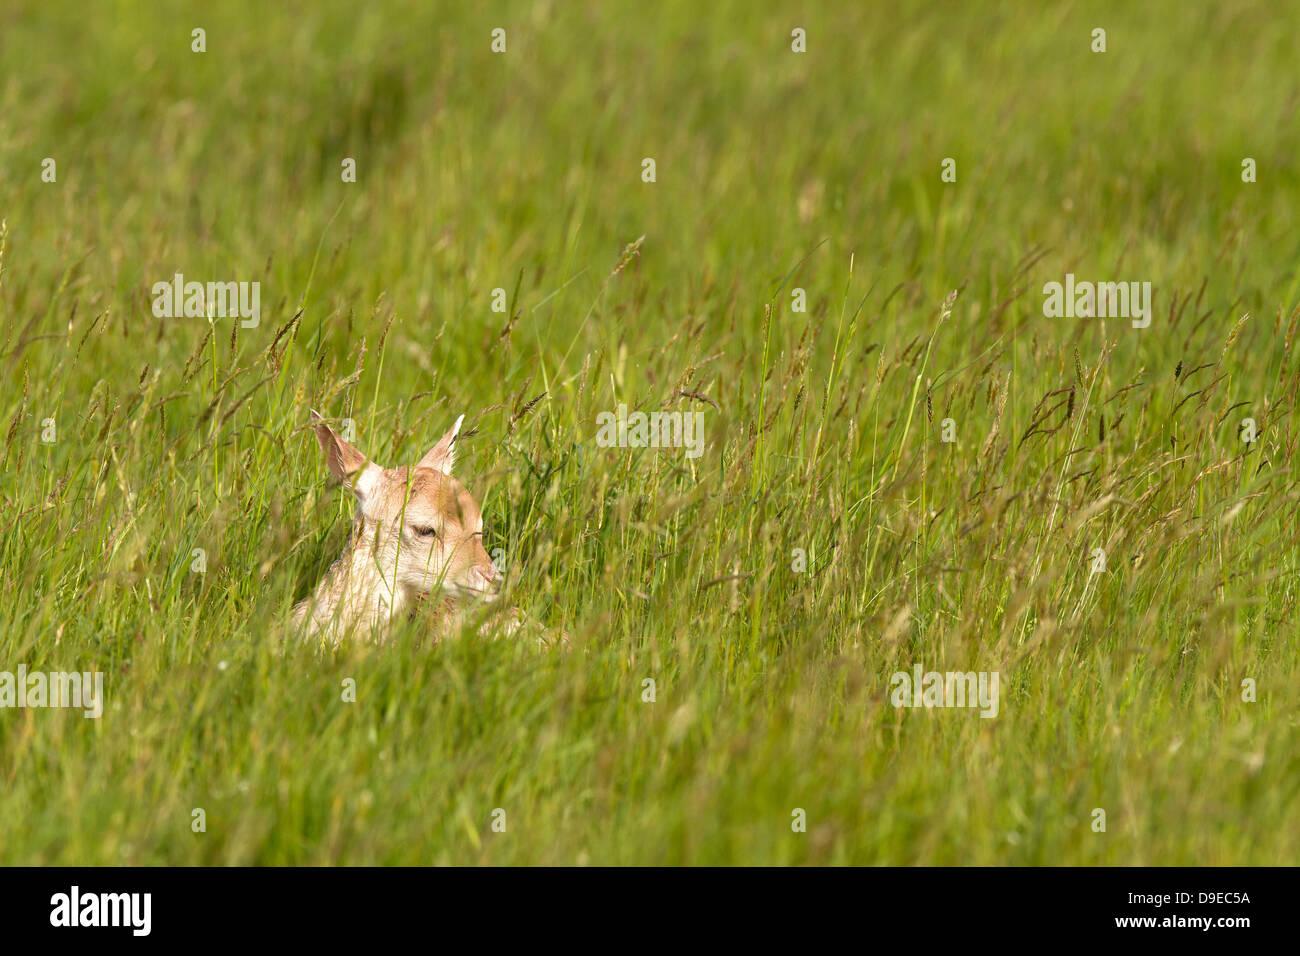 Young Fallow deer, dama dama in long grass - Stock Image